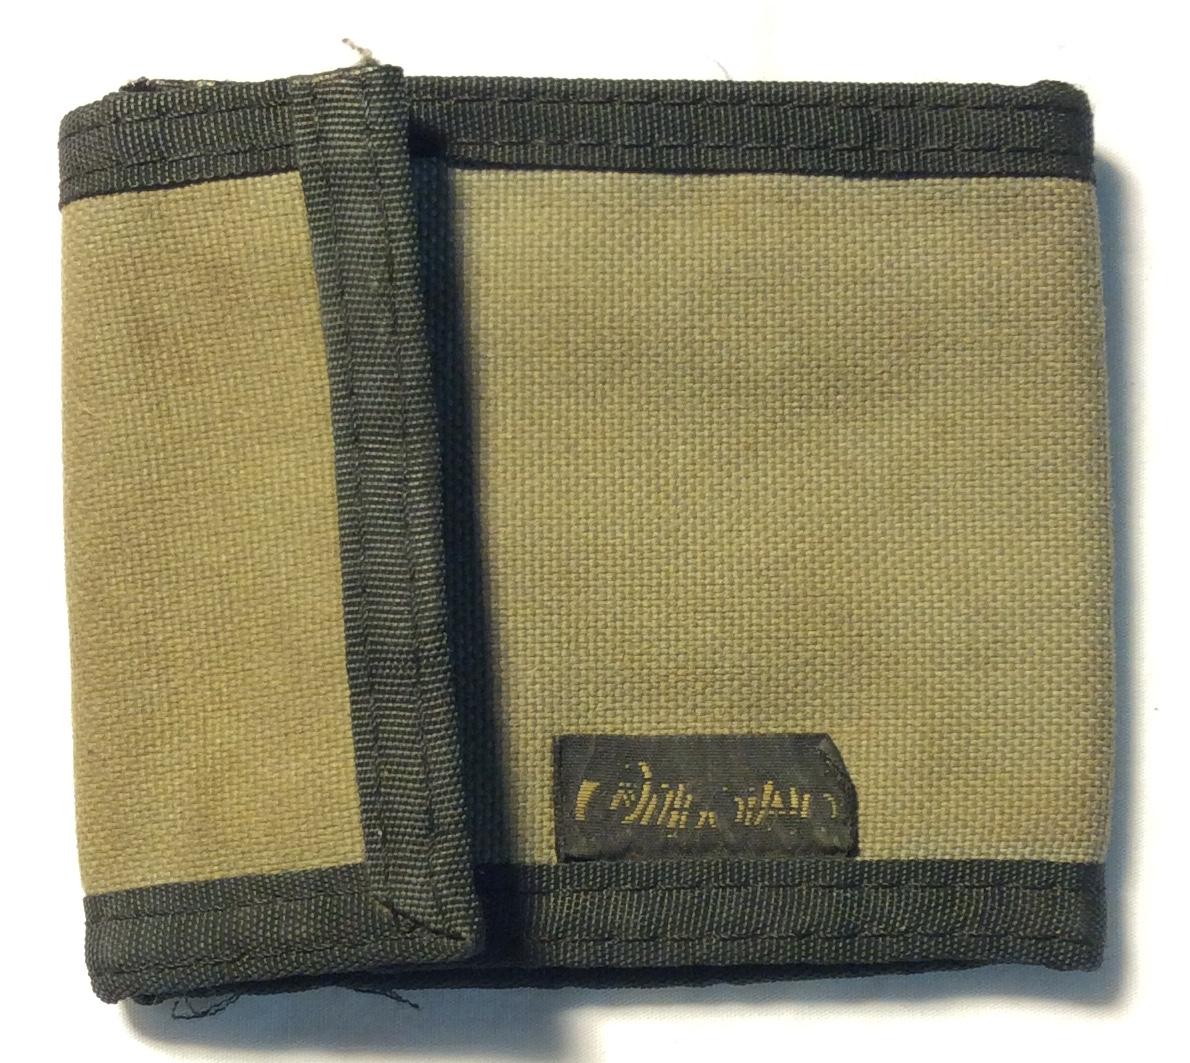 Tan and woven fabric w/ black fabric